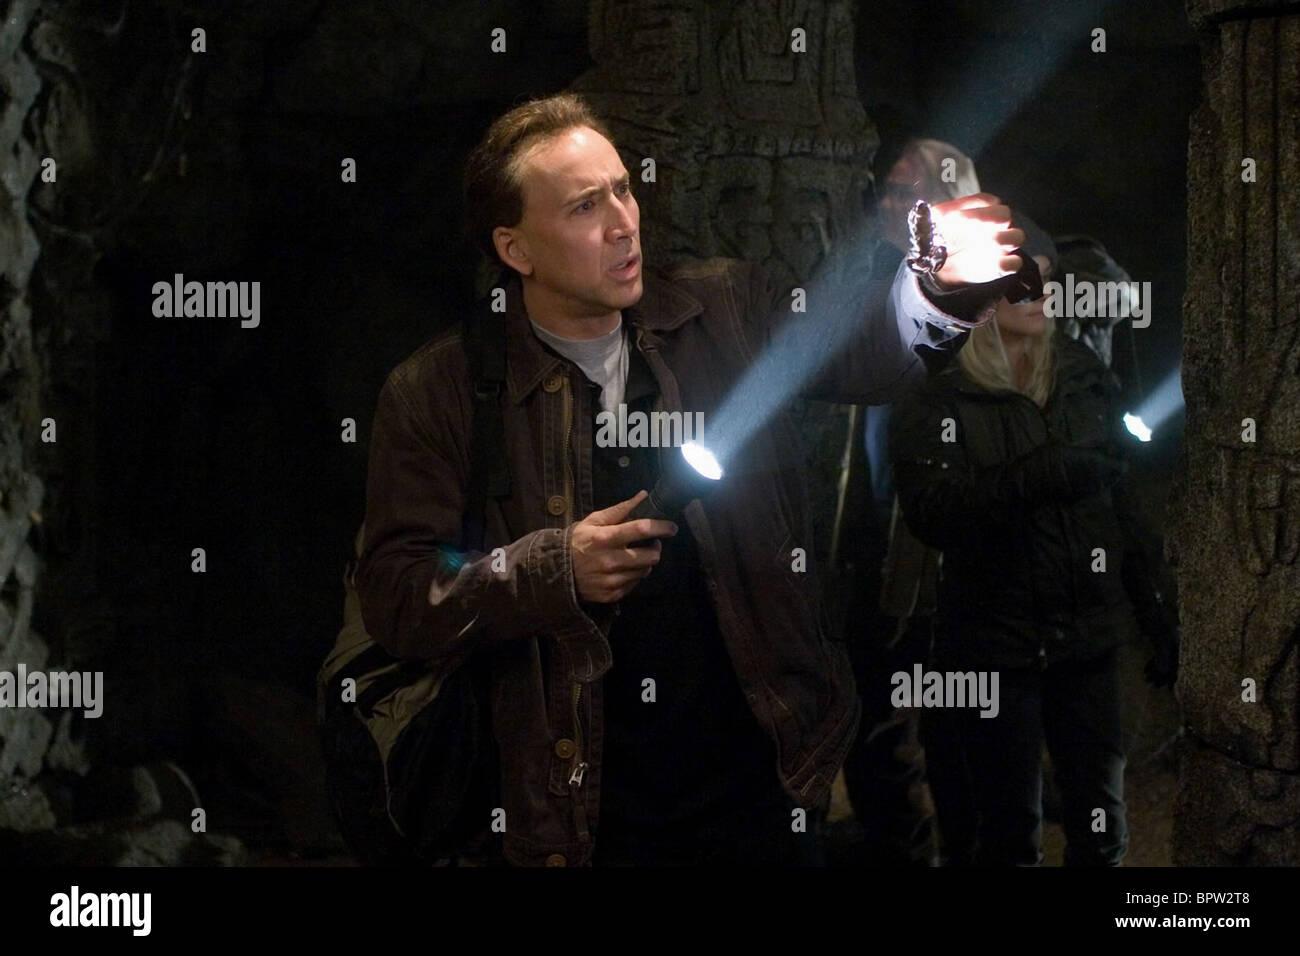 Nicolas Cage National Treasure Book Of Secrets National Treasure 2 Stock Photo Alamy